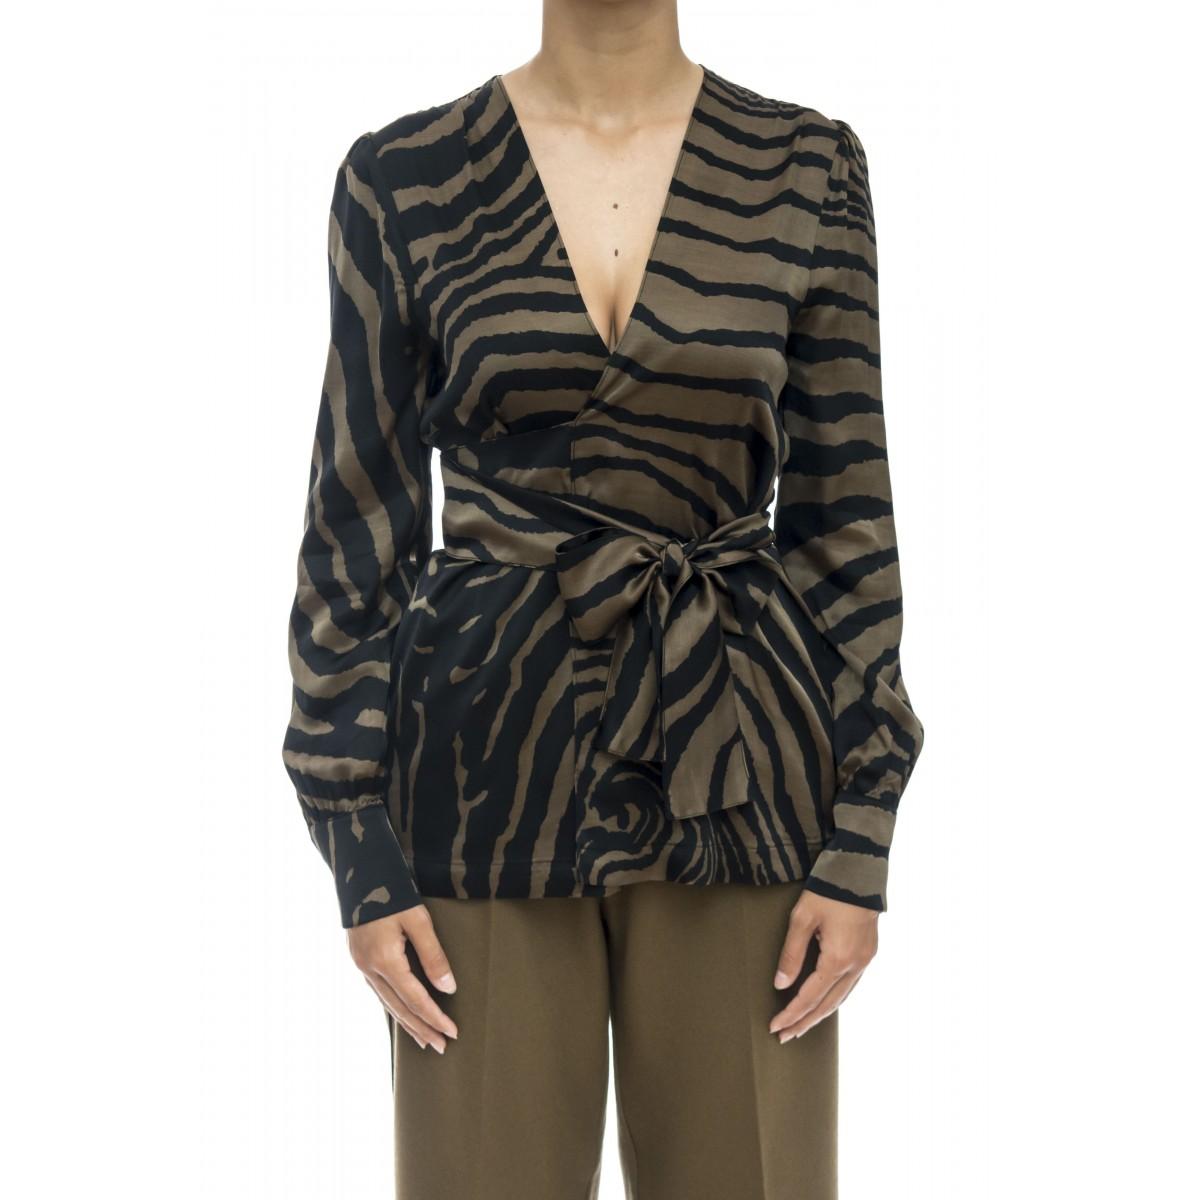 Camicia donna - J2021/z  camicia incrociata zebra